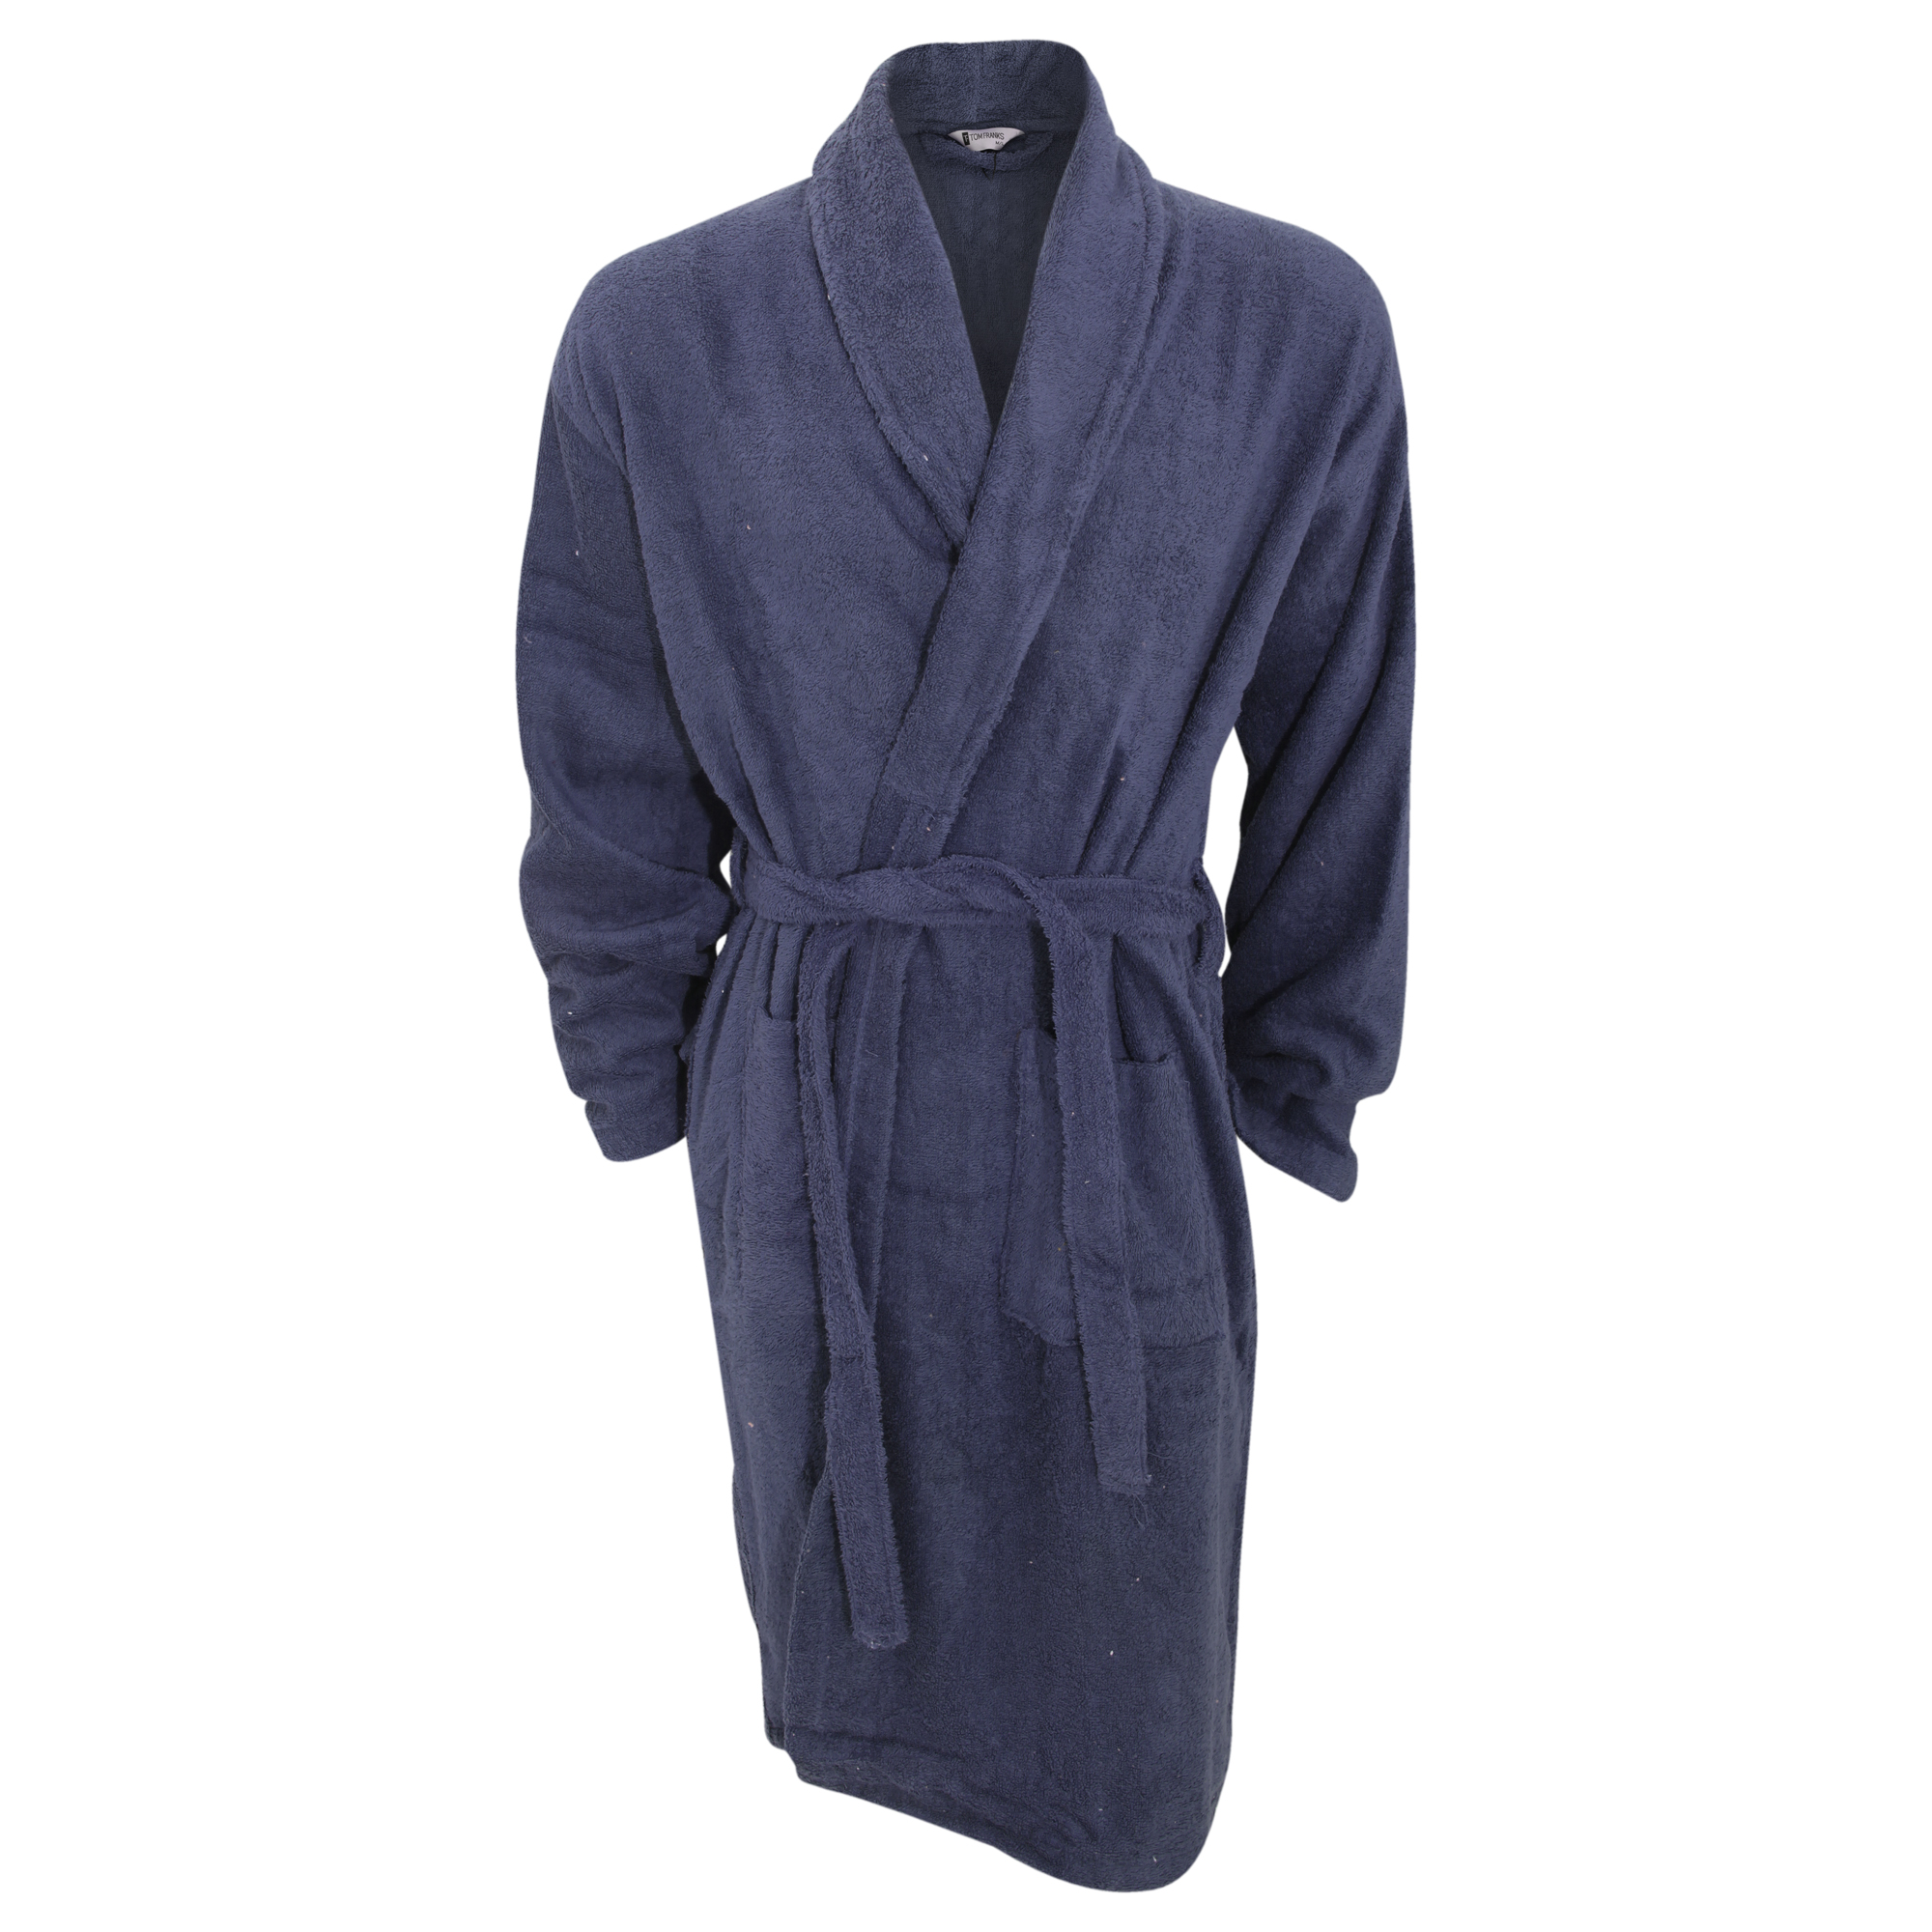 Robe Australia: Mens Plain Cotton Towelling Robe/Dressing Gown